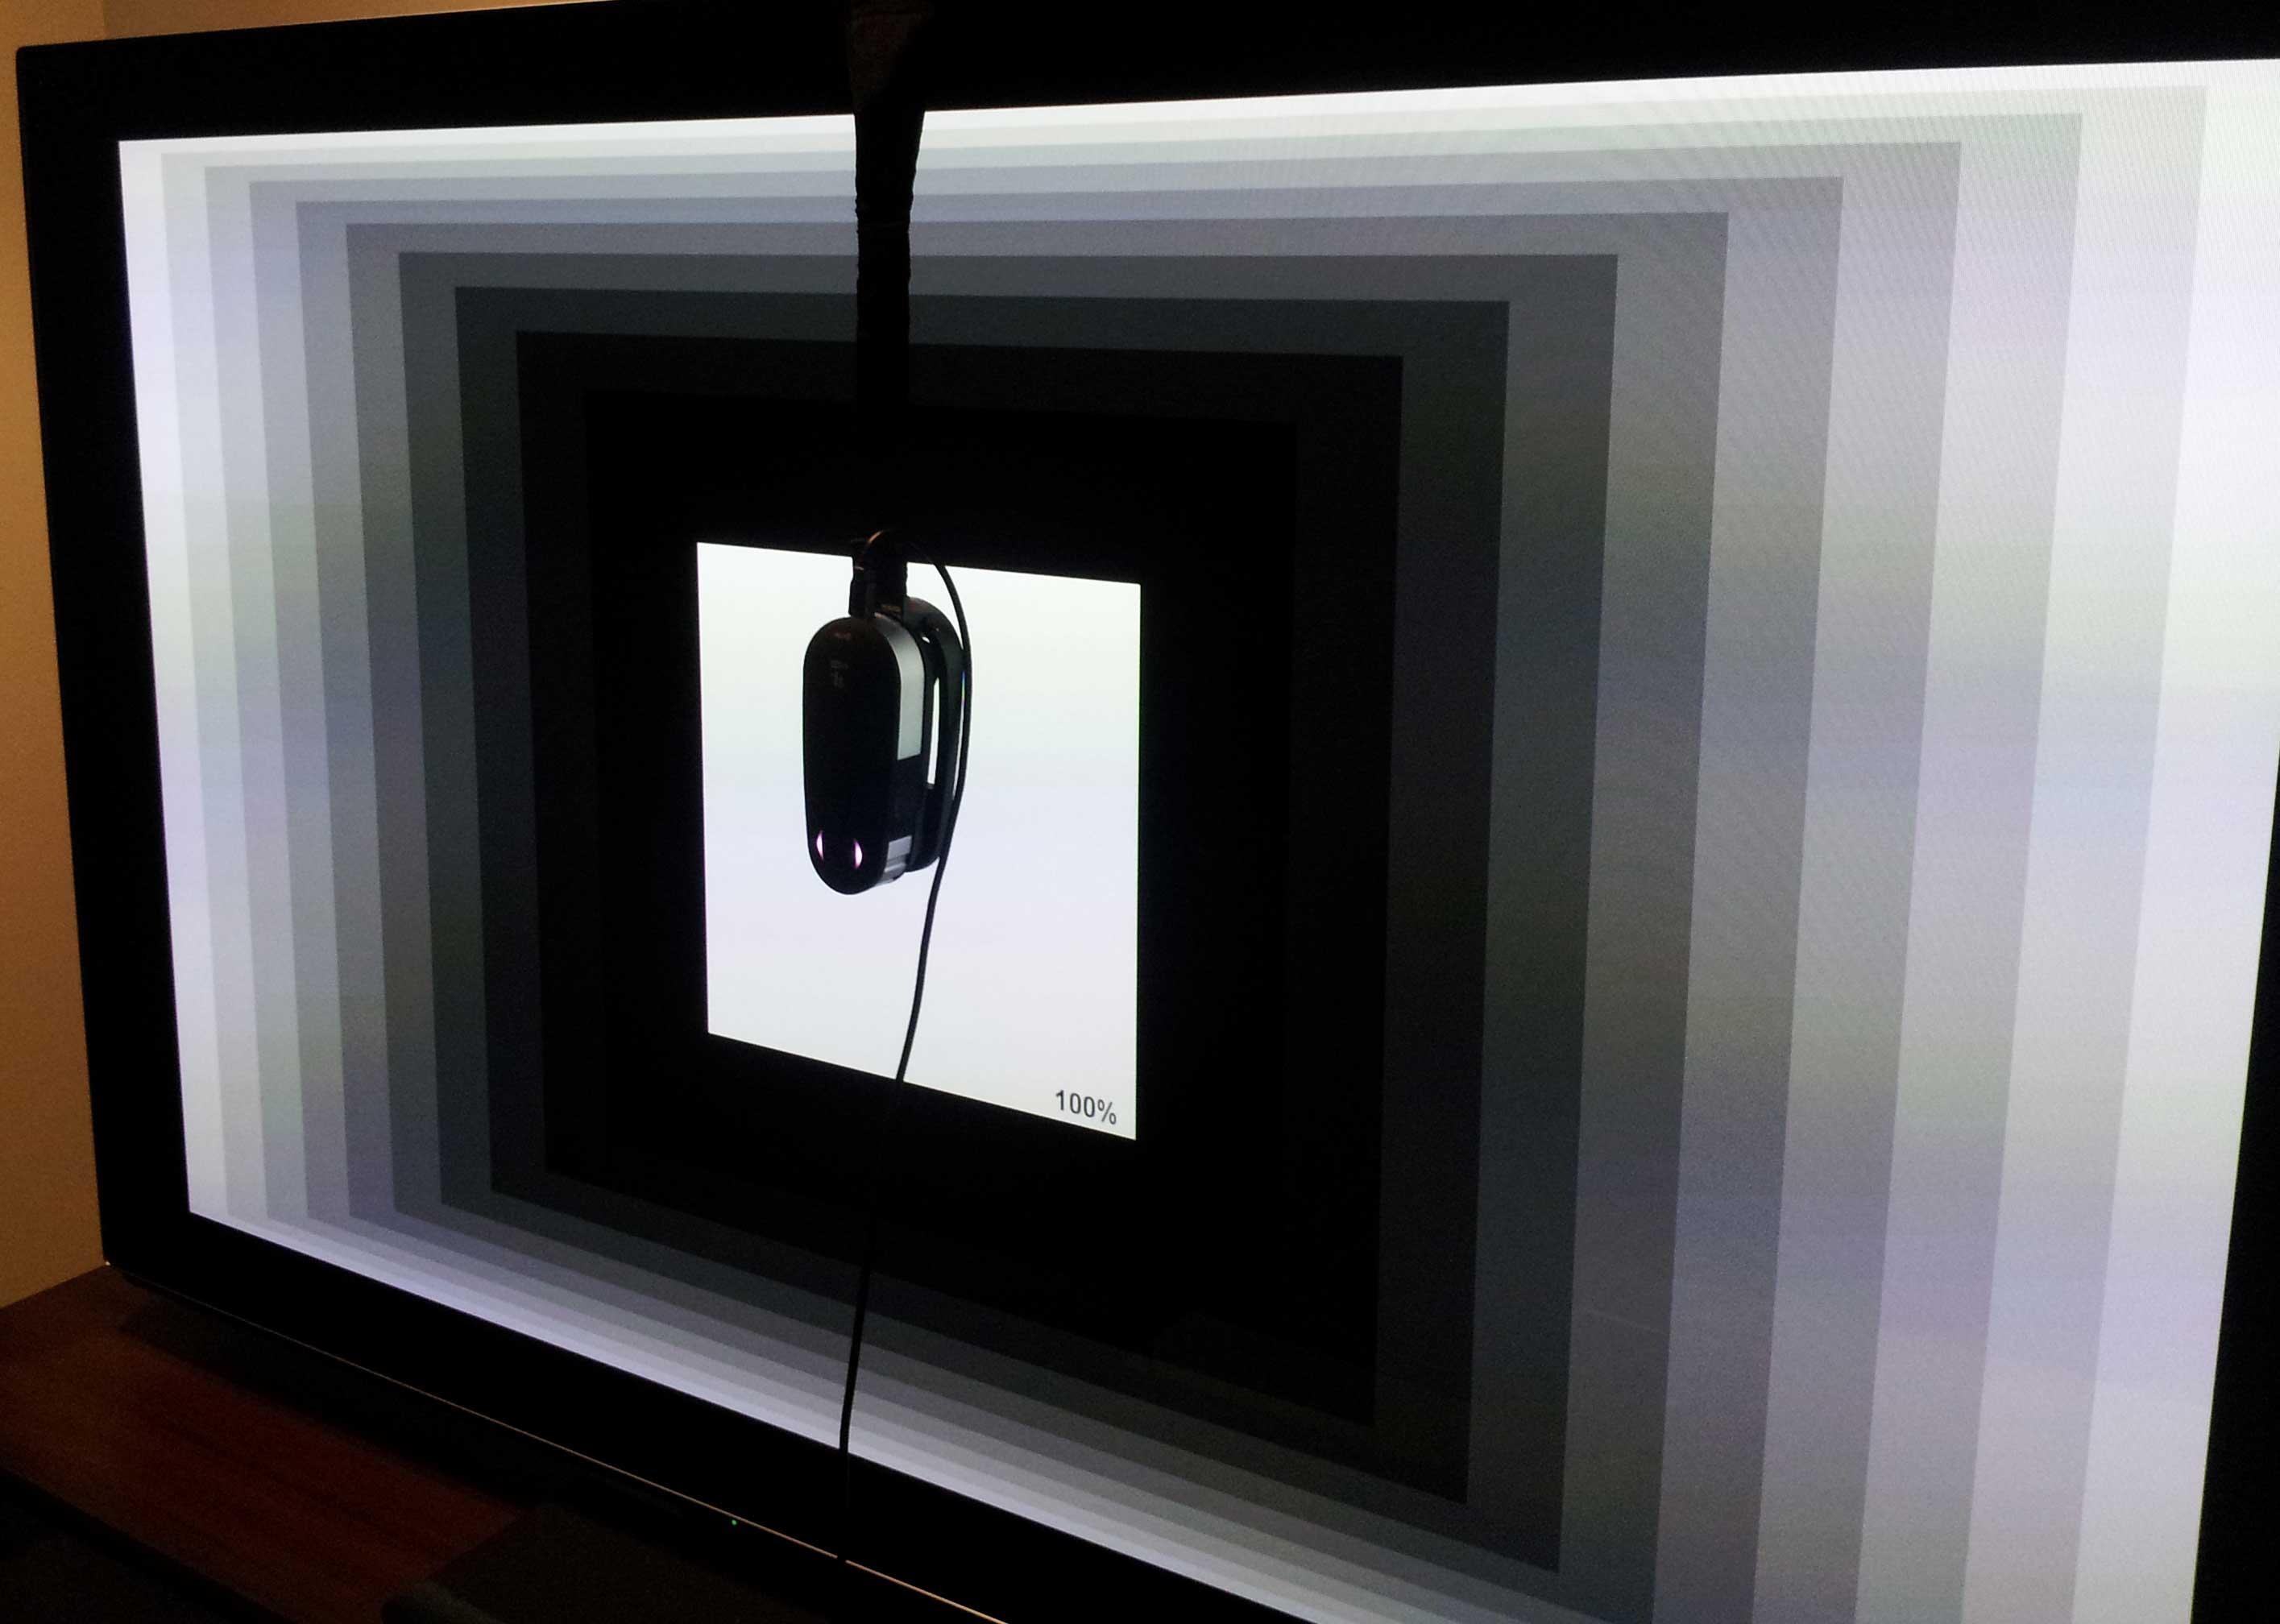 1 pro 2 spectroradiometer calibrating plasma TV